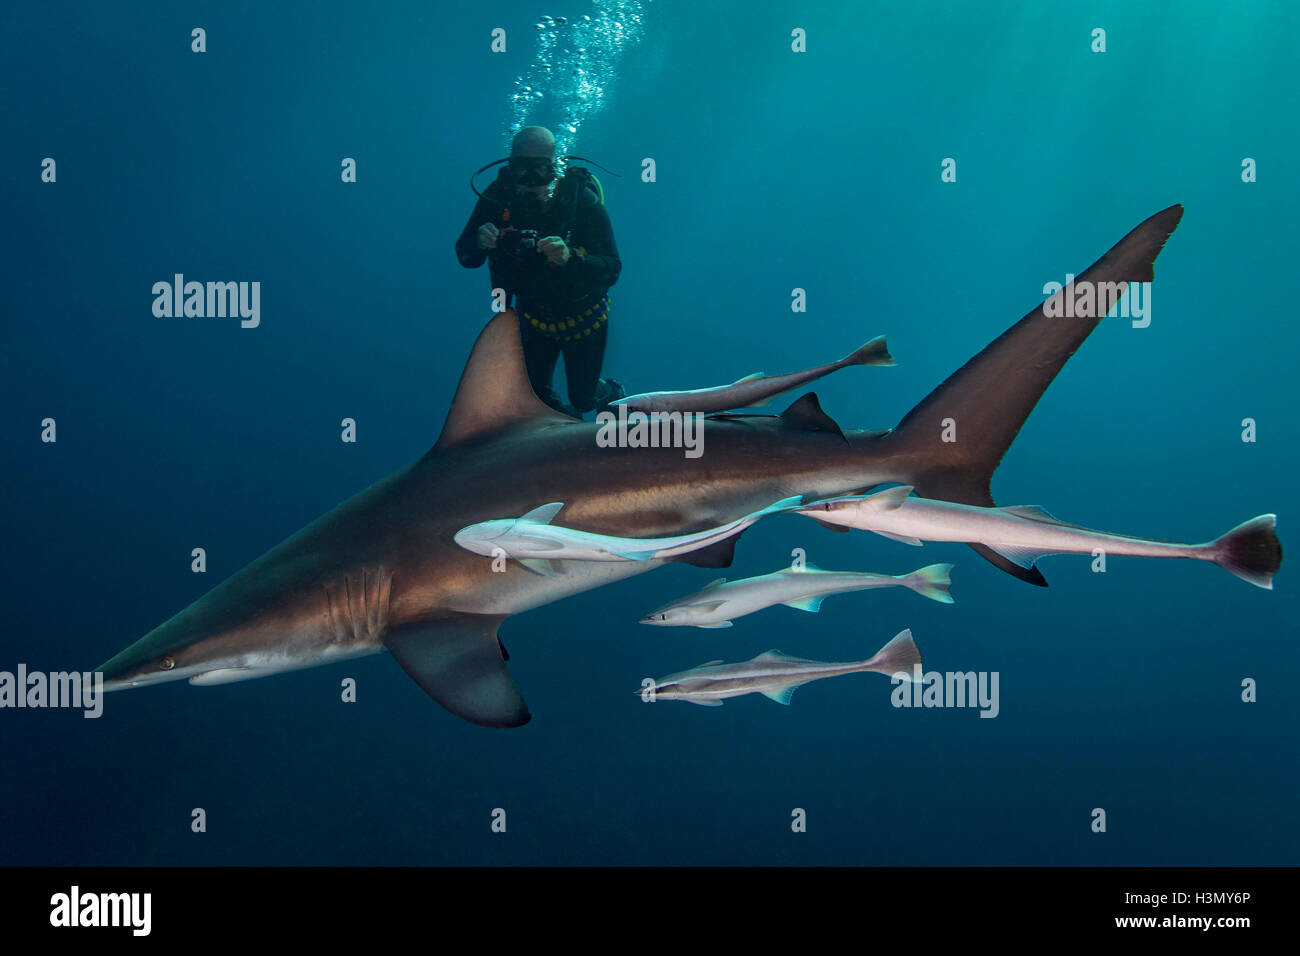 Large Oceanic Blacktip Shark (Carcharhinus Limbatus) circling diver, Aliwal Shoal, South Africa Stock Photo